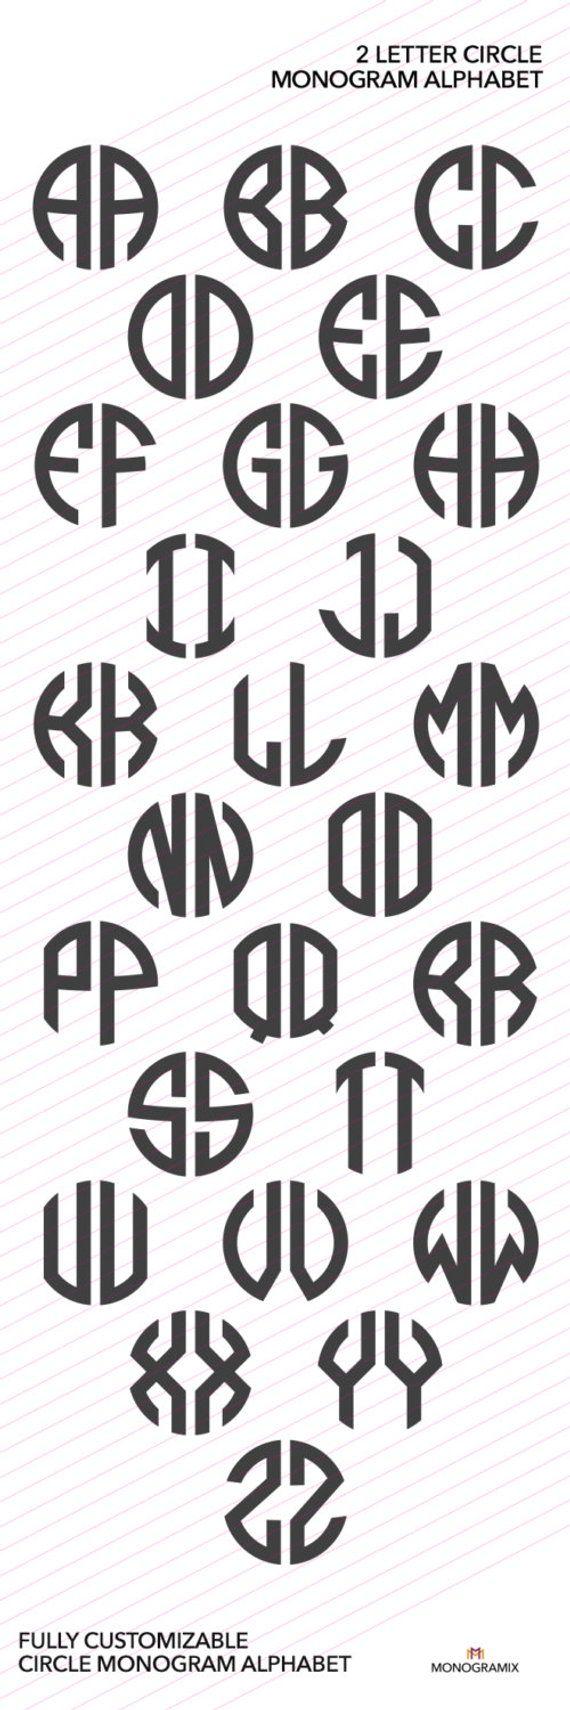 2 Letter SVG Monogram Font SVG Personal Monogram Font Letters SVG Personal Initials Monogram Svg Cut Dateien für Silhouette Studio, Cricut